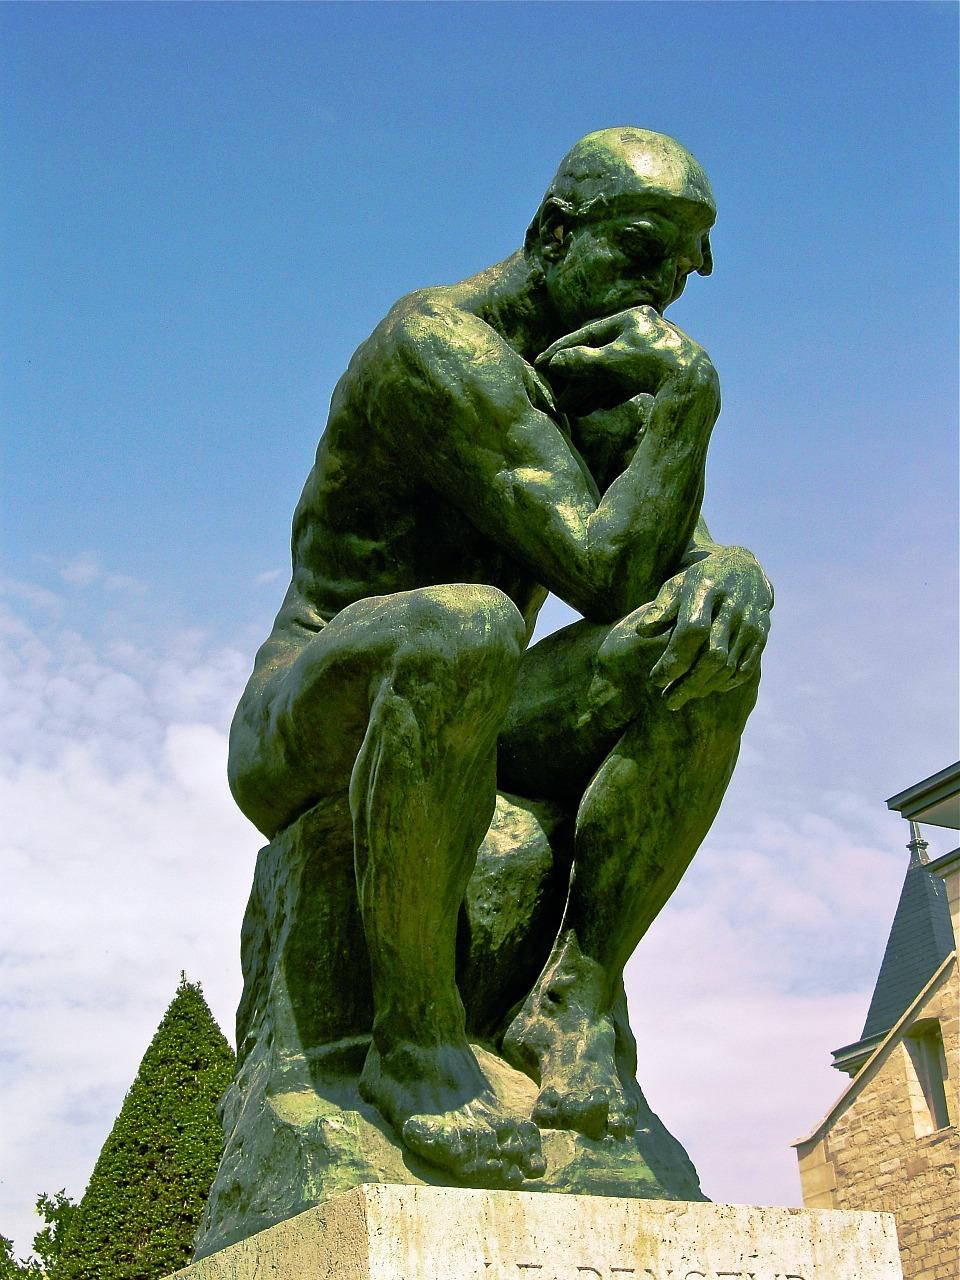 the-thinker-1144887_1280